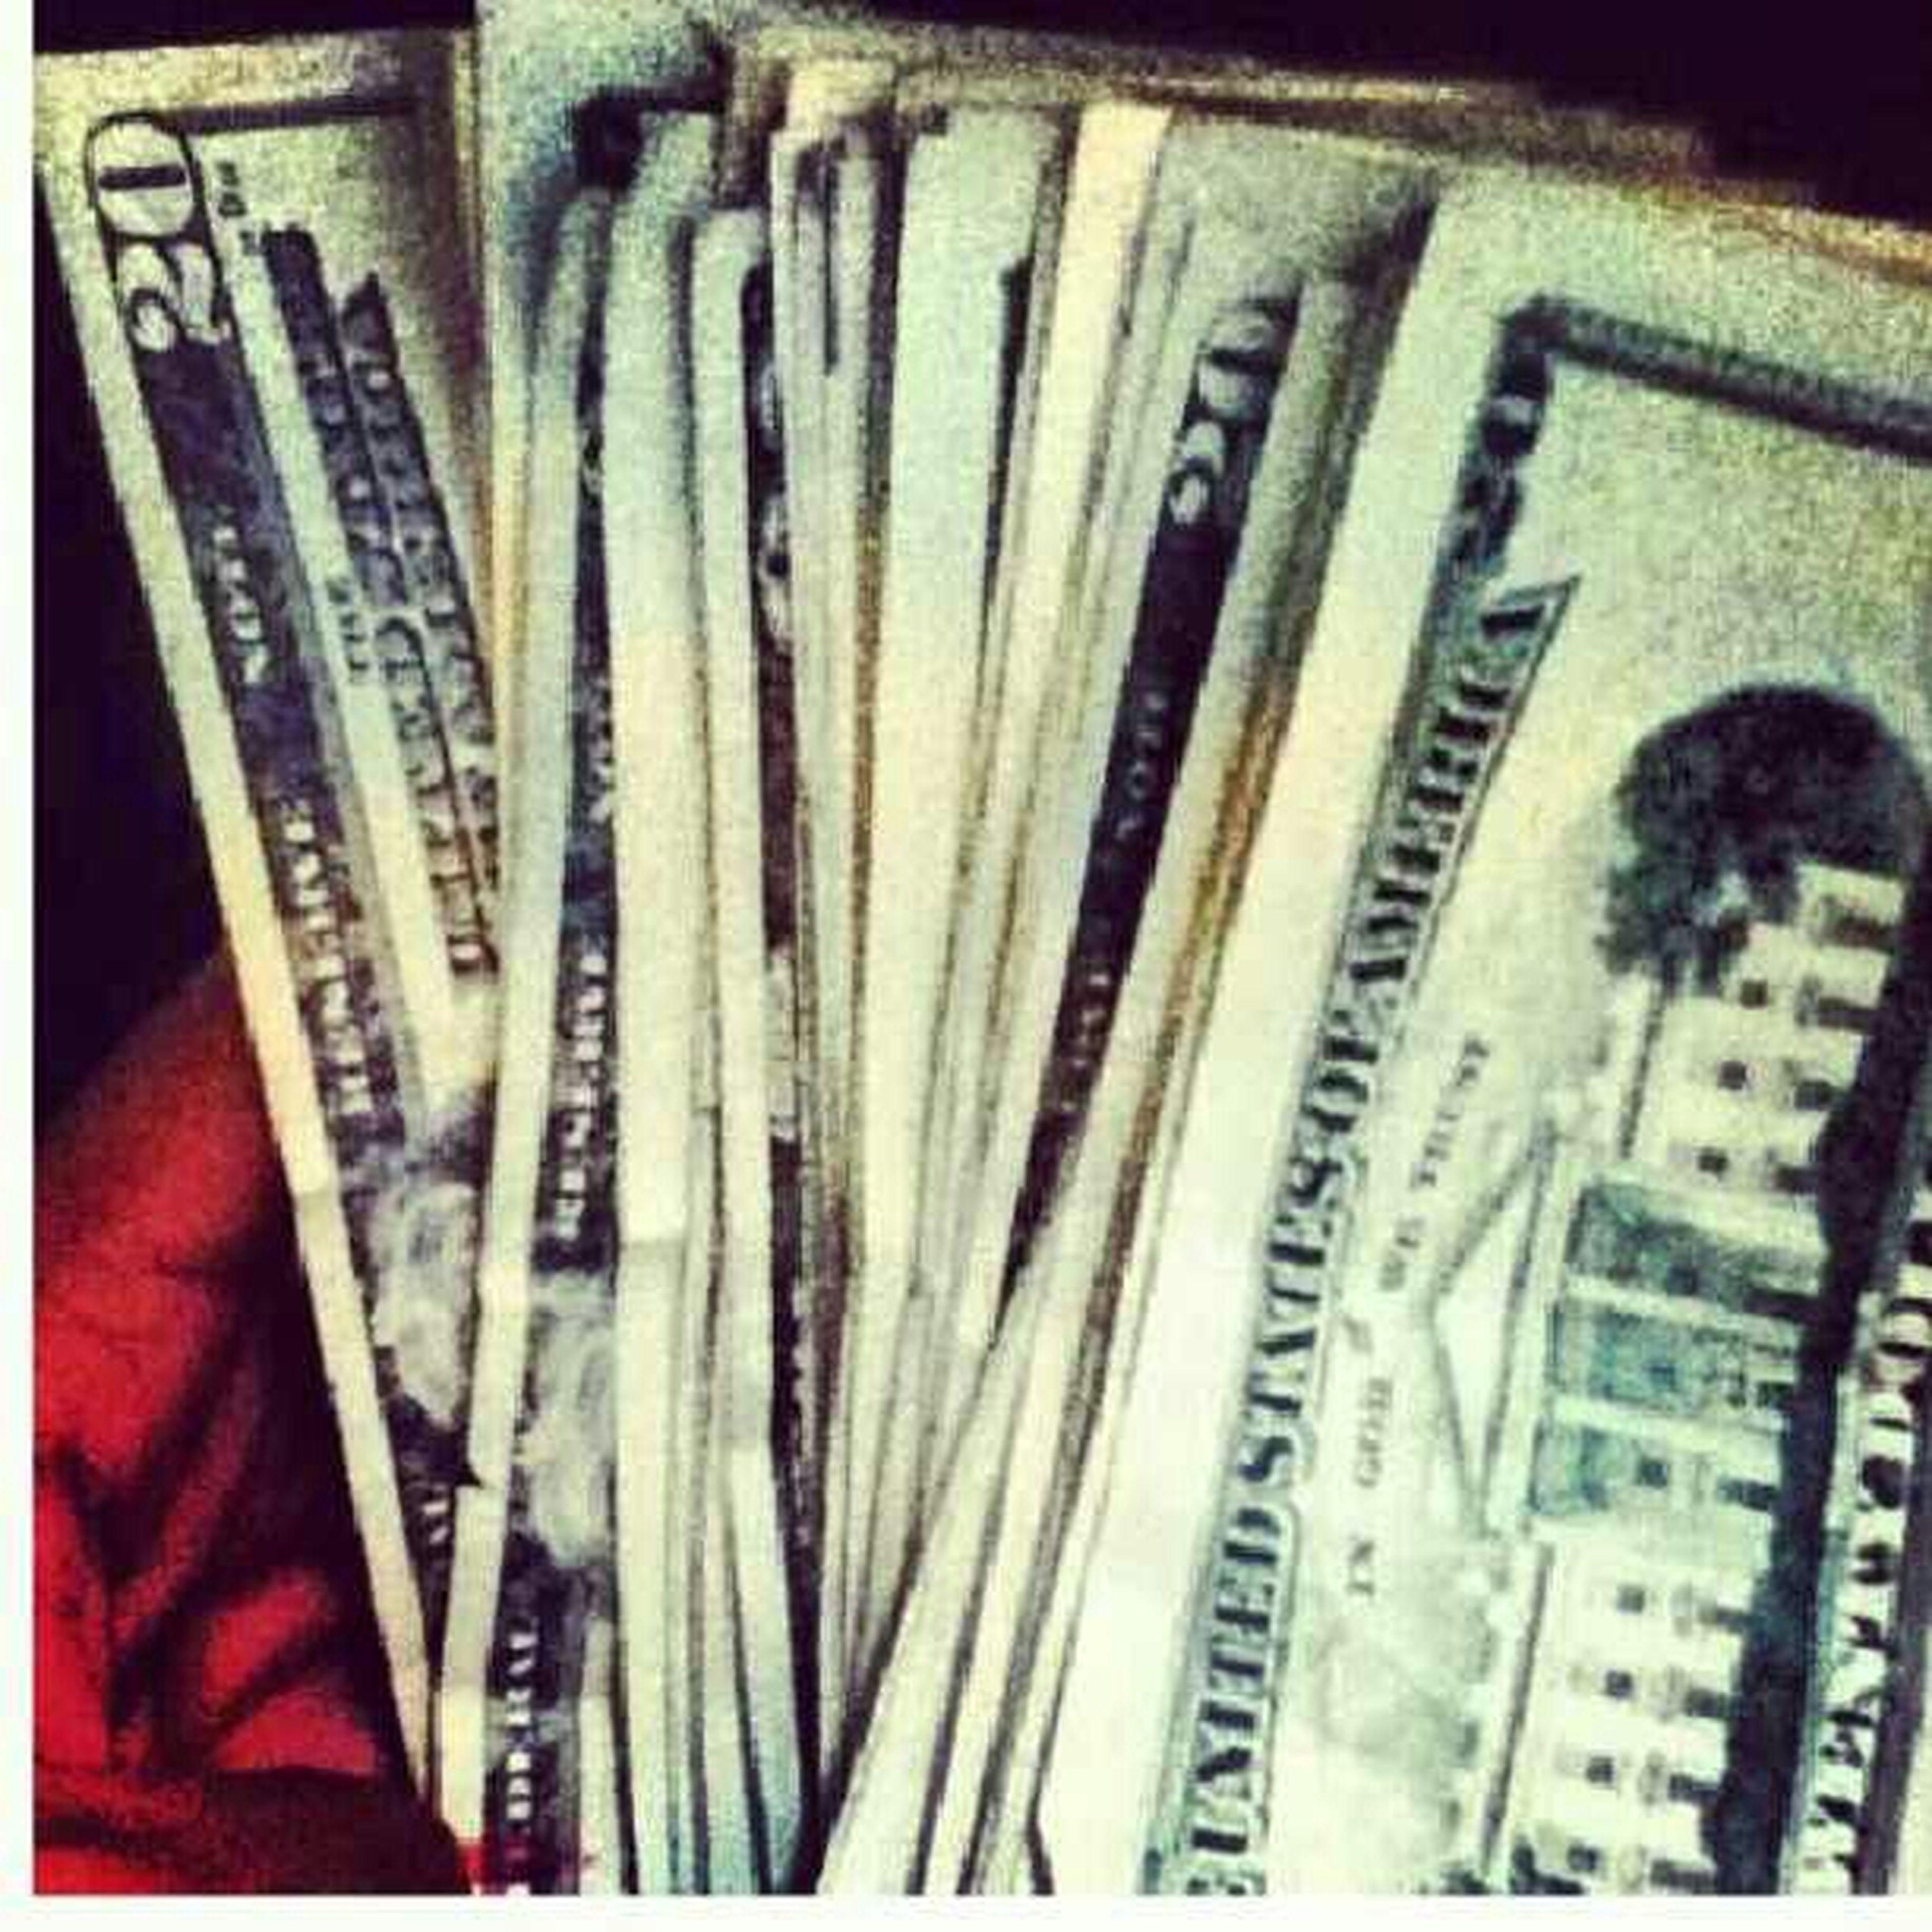 Im Alwayz Sauced Up Nd Im Band Up No Drum Major Fym Diz Pic Ws Frm Yesterday GSM Or Nun Mane $$$$$$$